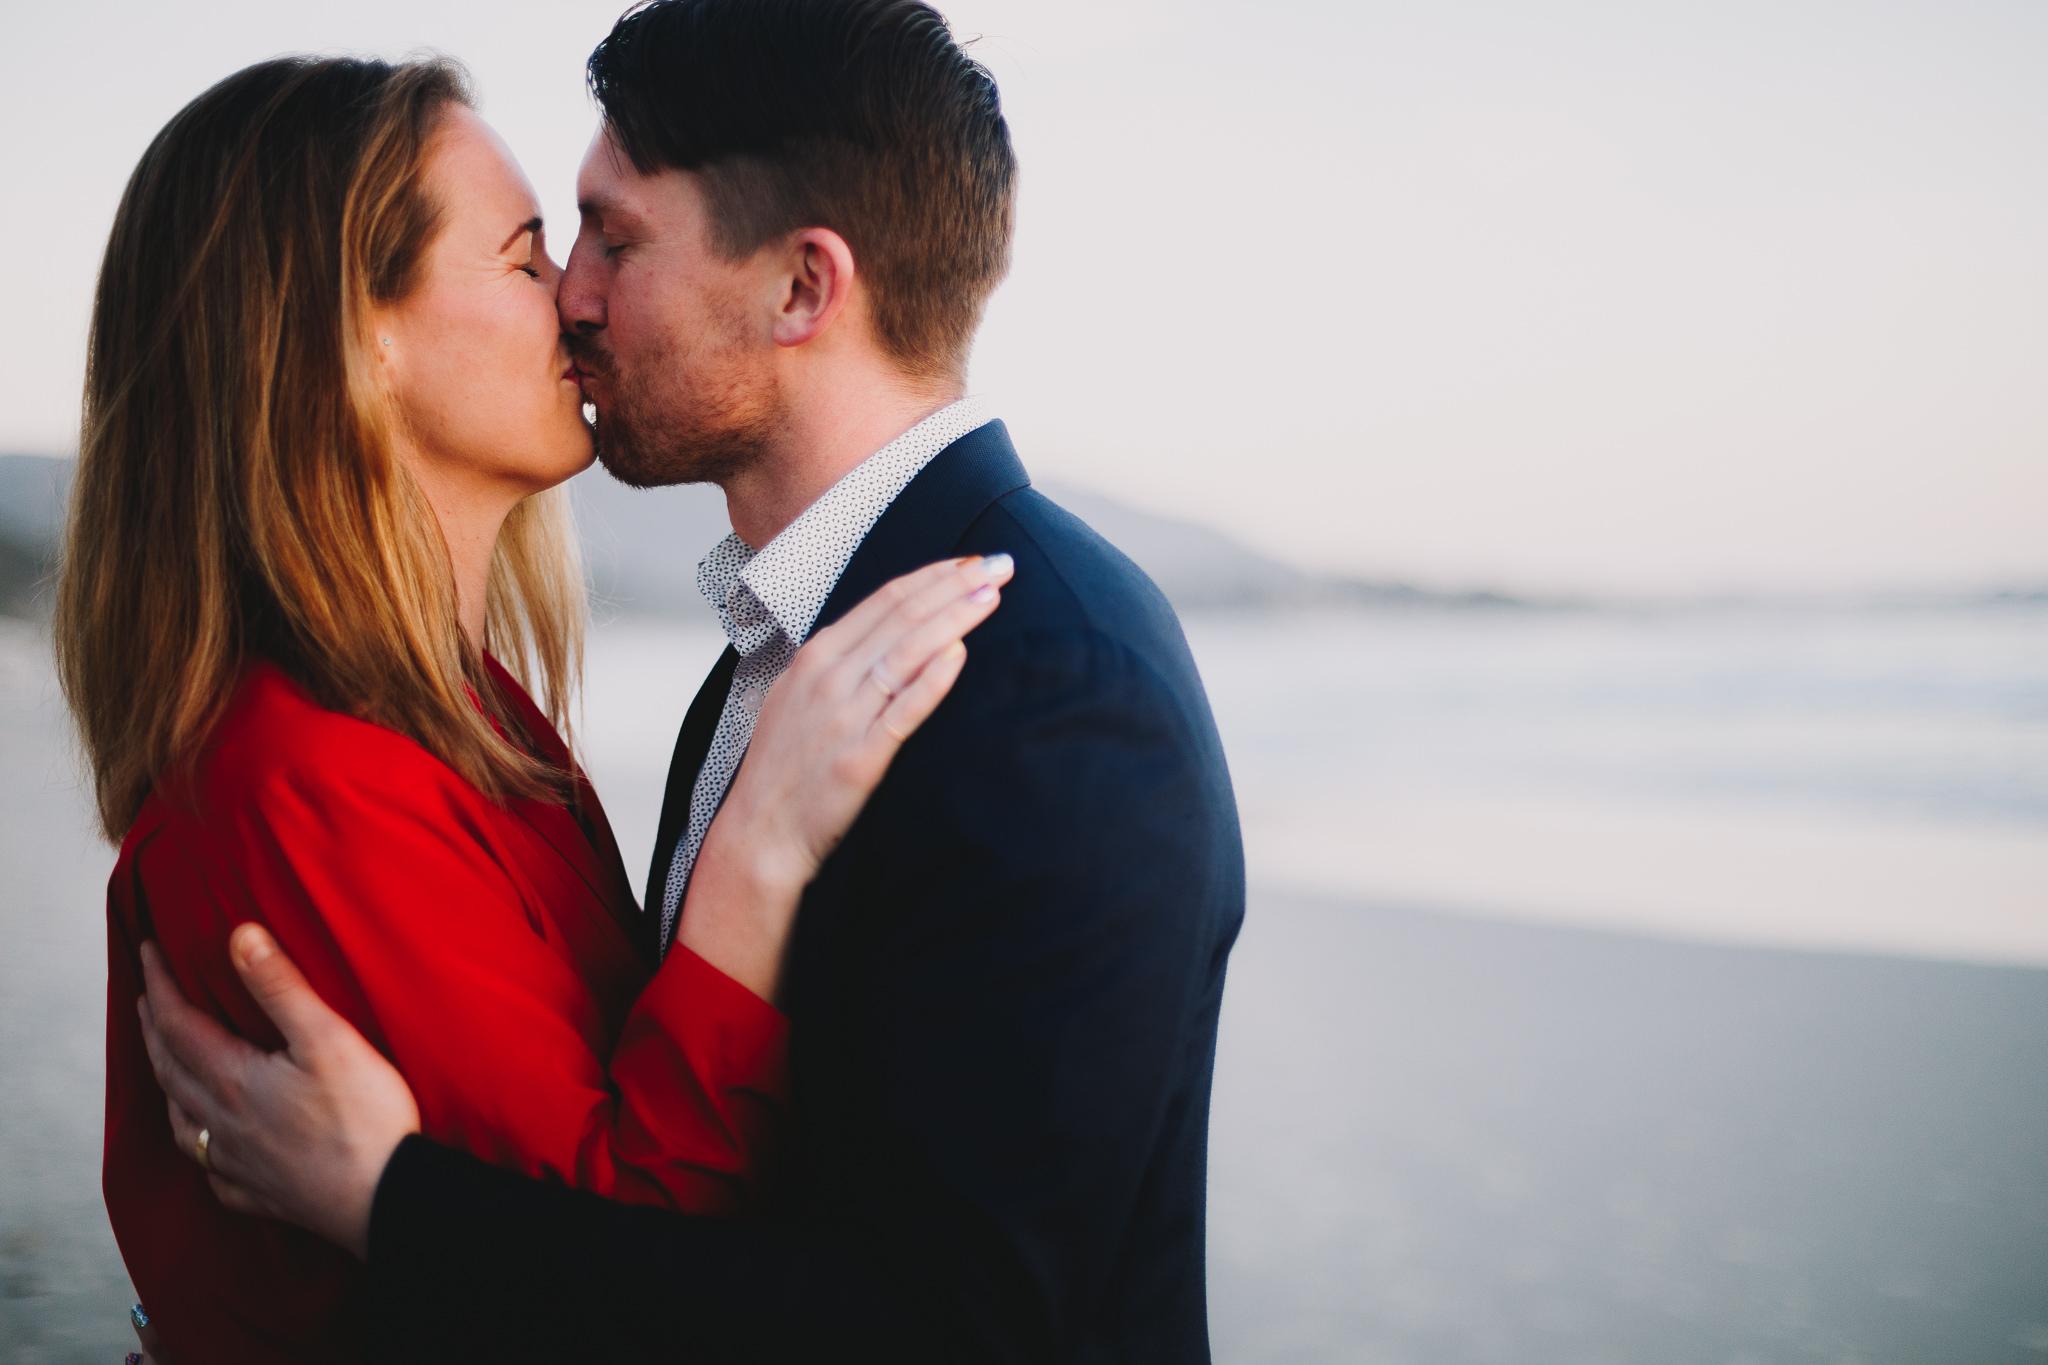 Archer Inspired Photography Carmel Beach California Wedding Engagement Lifestyle Anniversary Natural Light Photographer-104.jpg